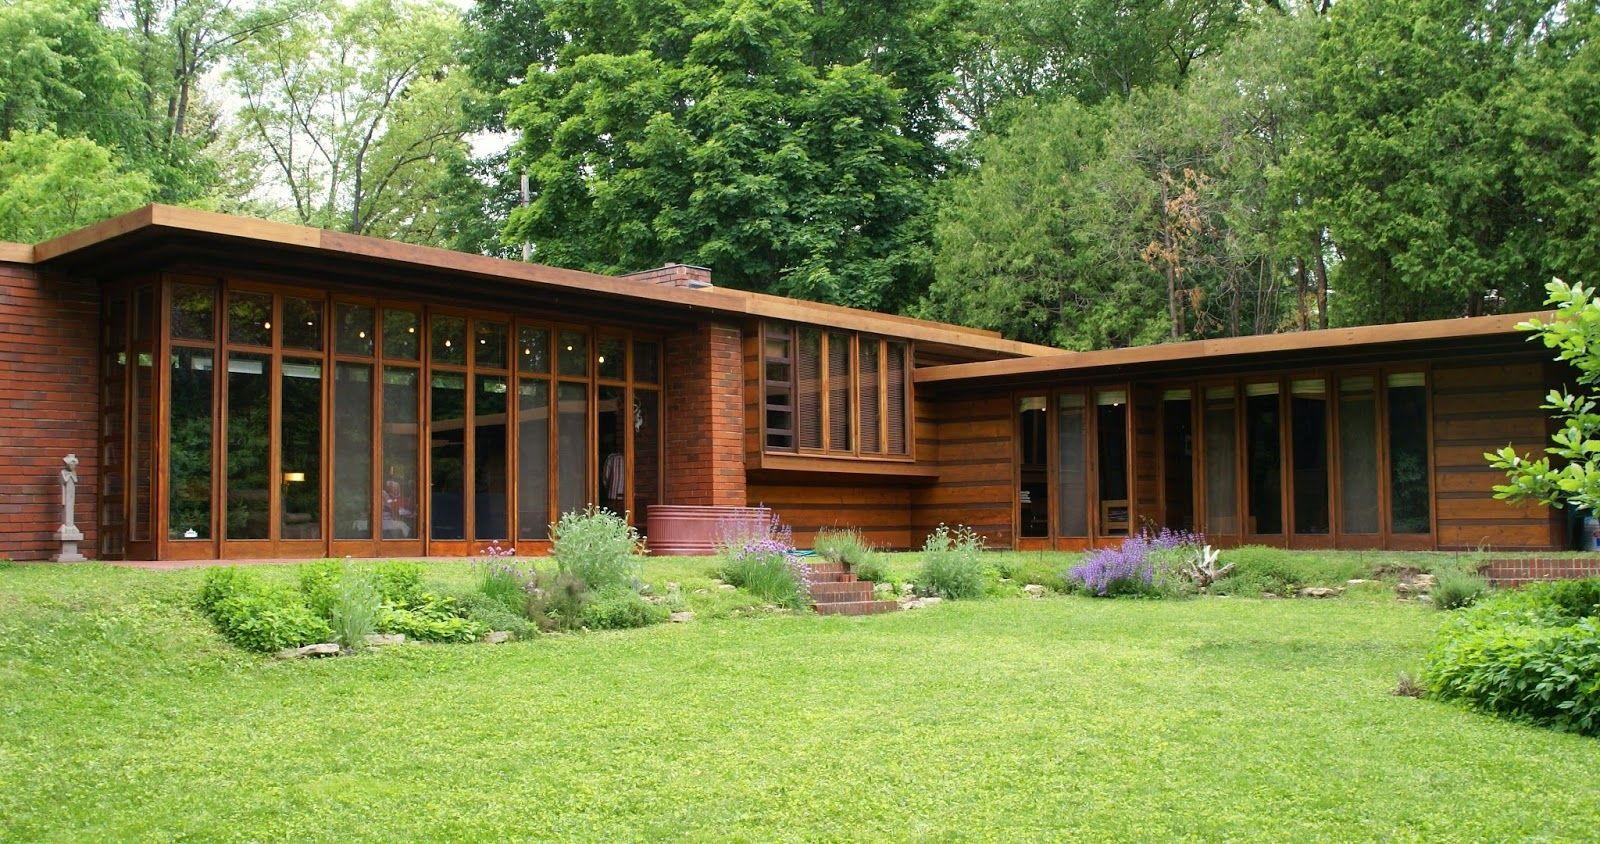 Historia de la arquitectura moderna casa jacobs 1 frank for Arquitectura moderna